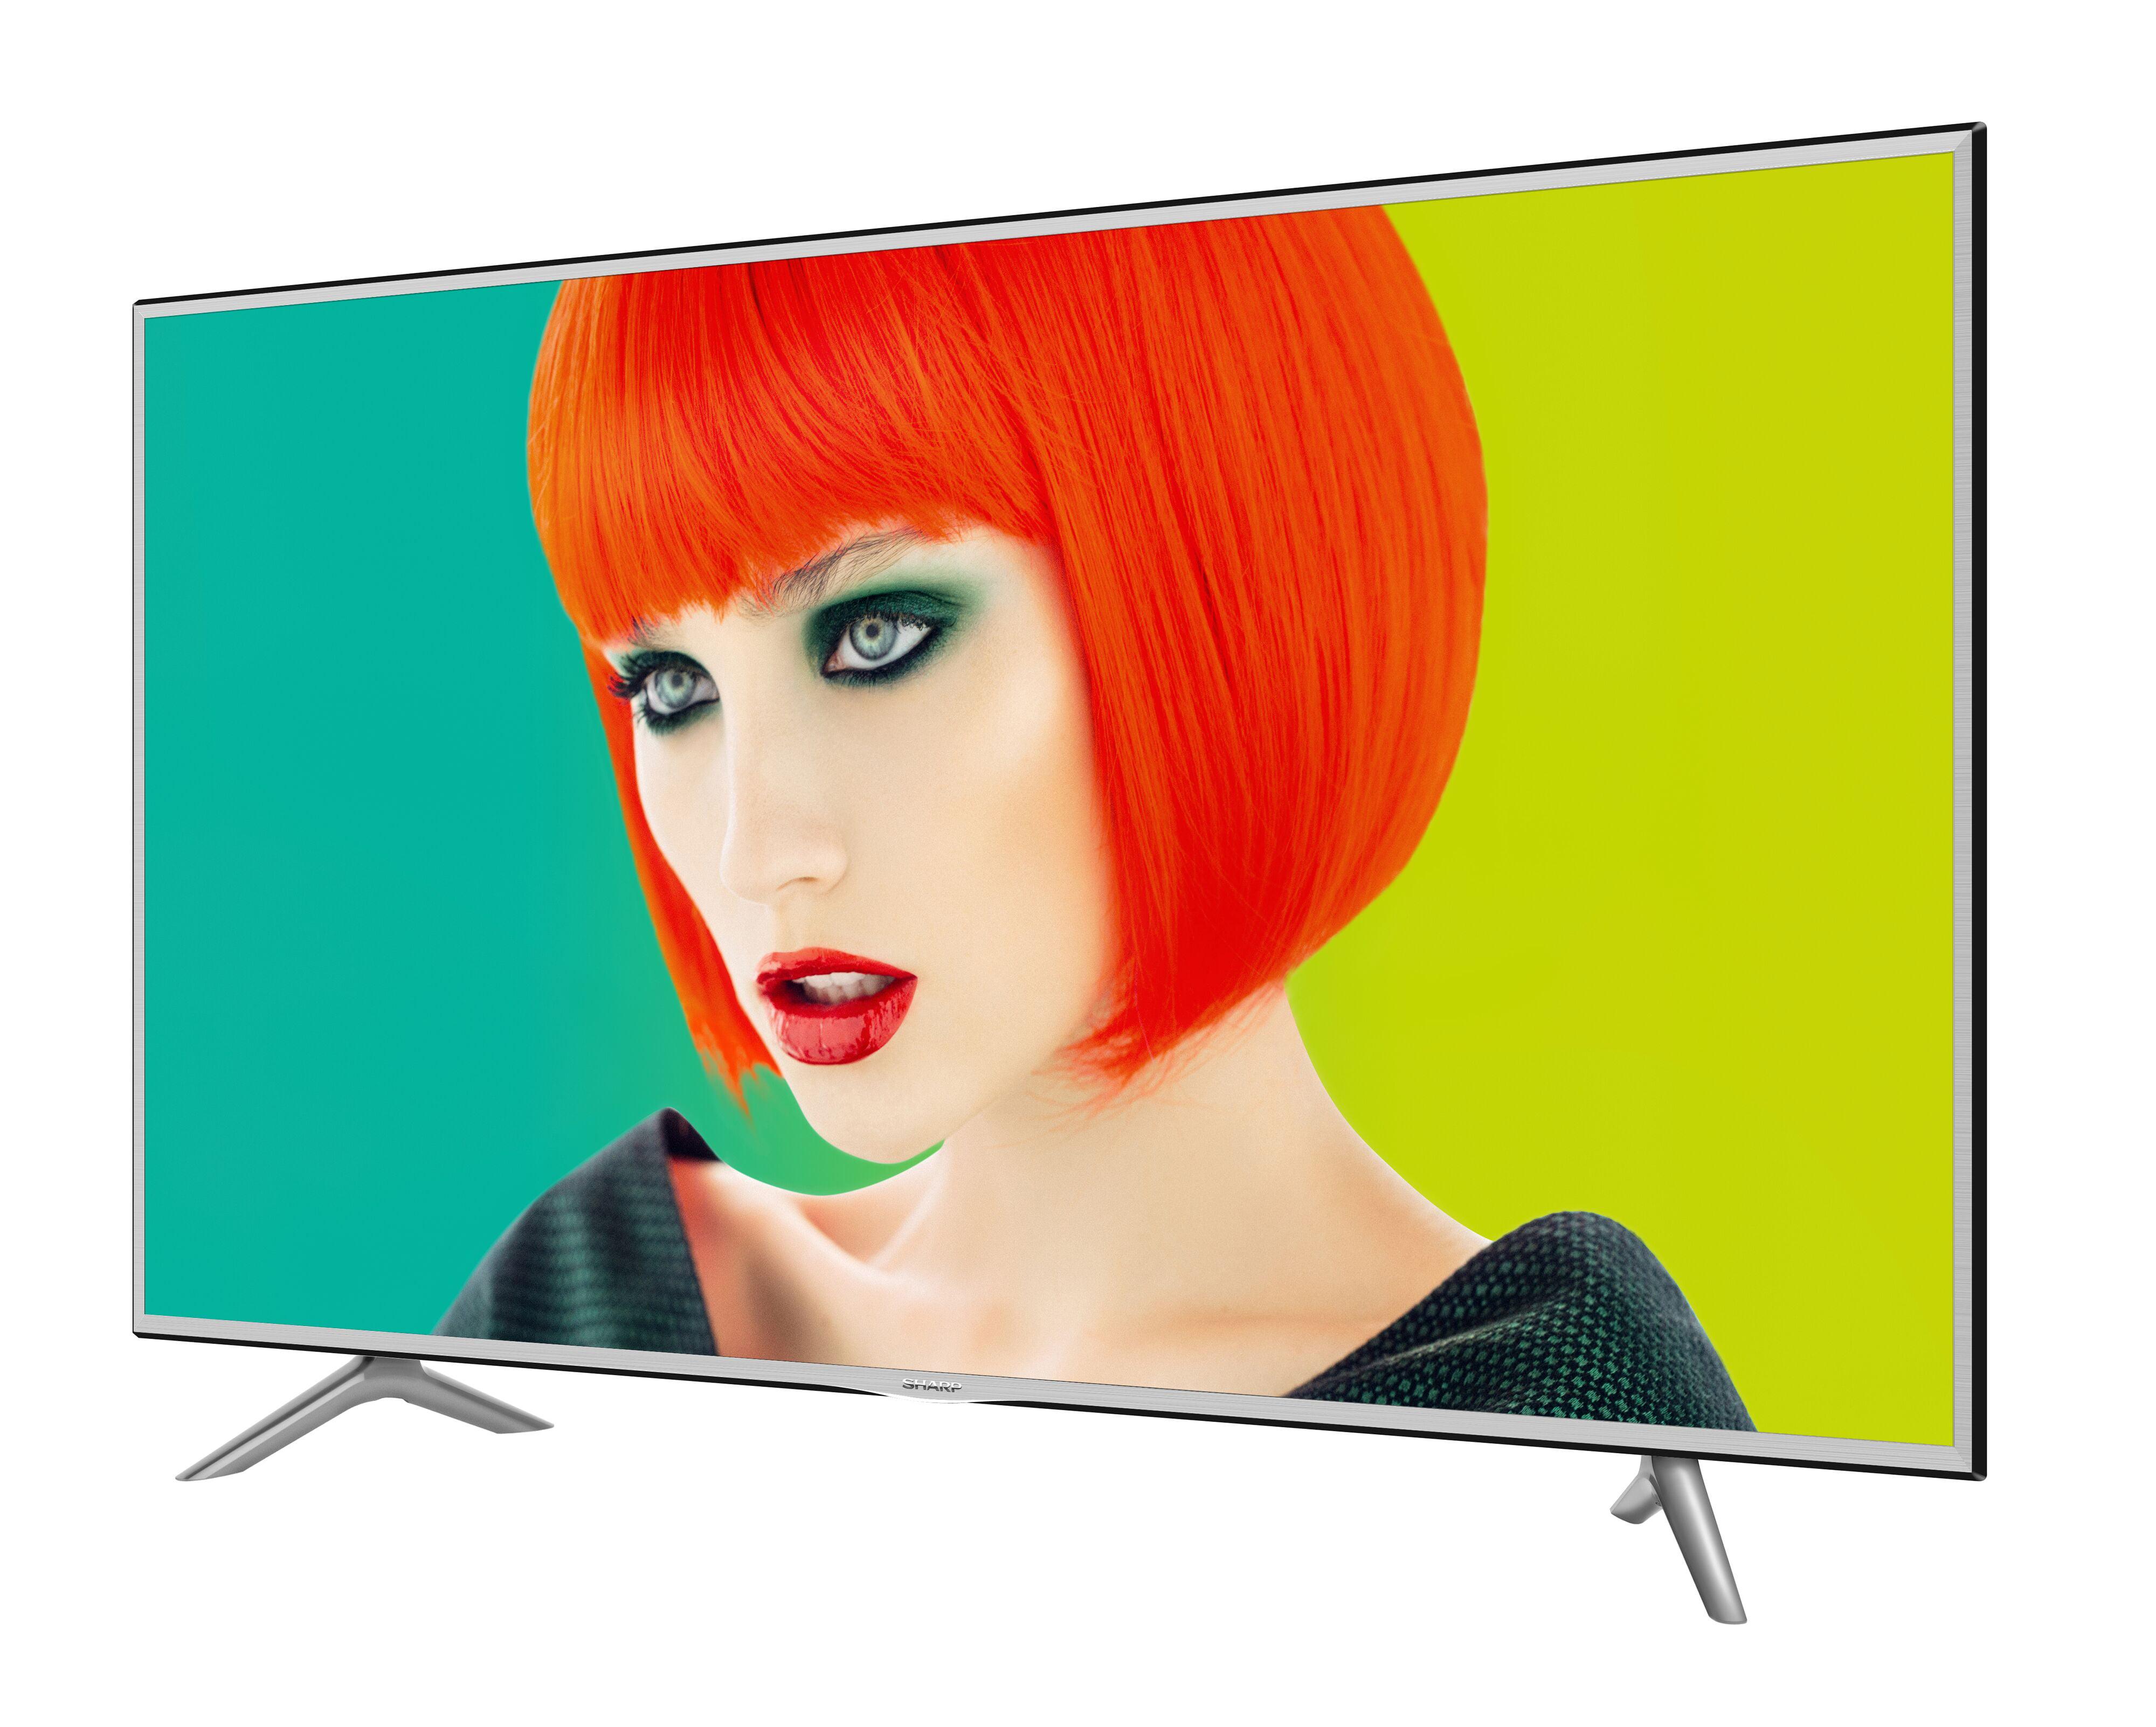 "Sharp AQUOS 55"" Class 4K (2160P) LED Smart TV (LC55P7000U) by Hisense"